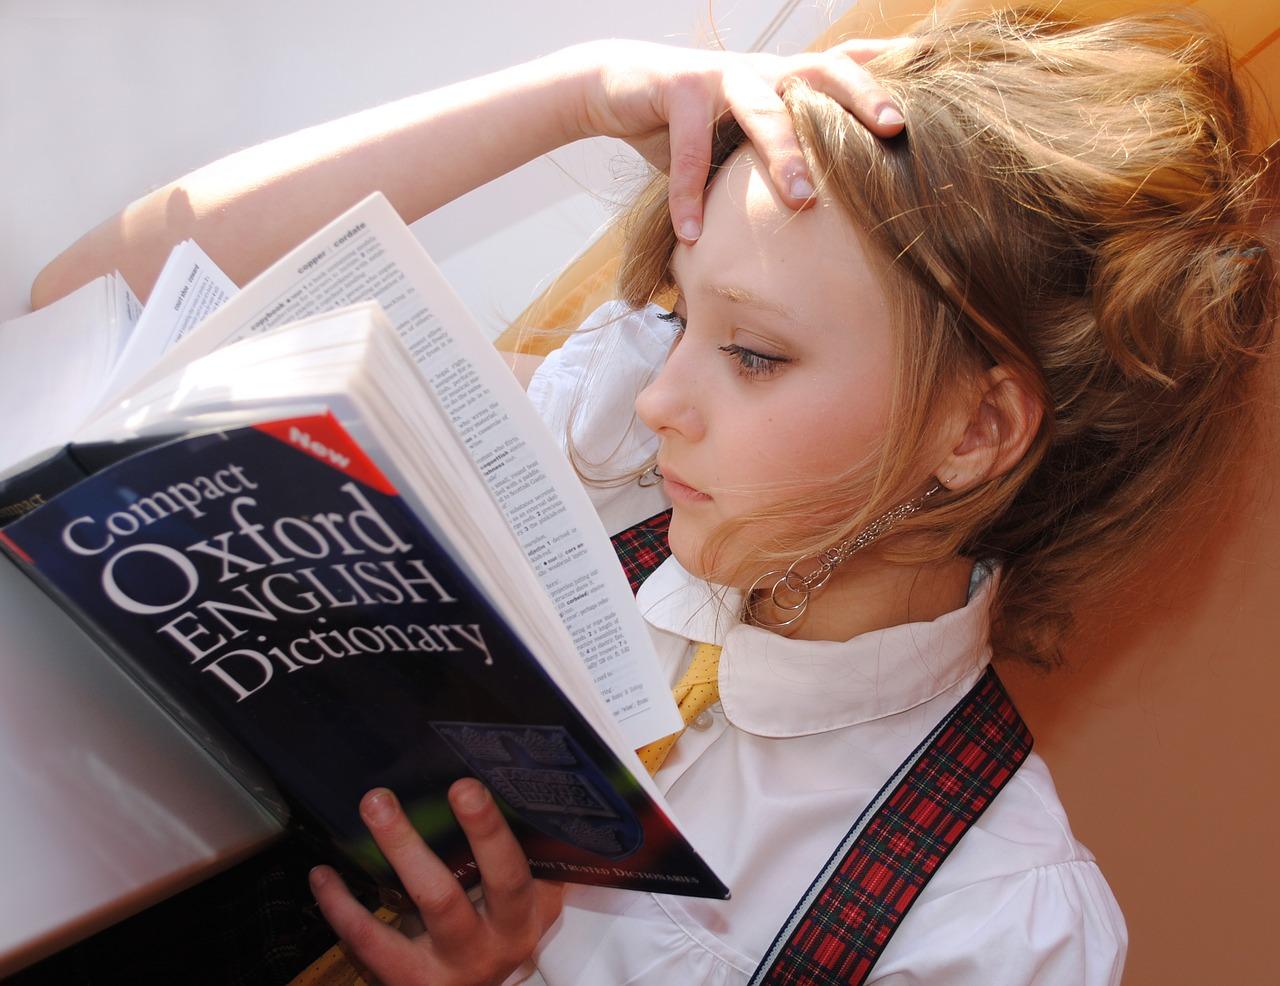 https://pixabay.com/en/girl-english-dictionary-study-2771936/